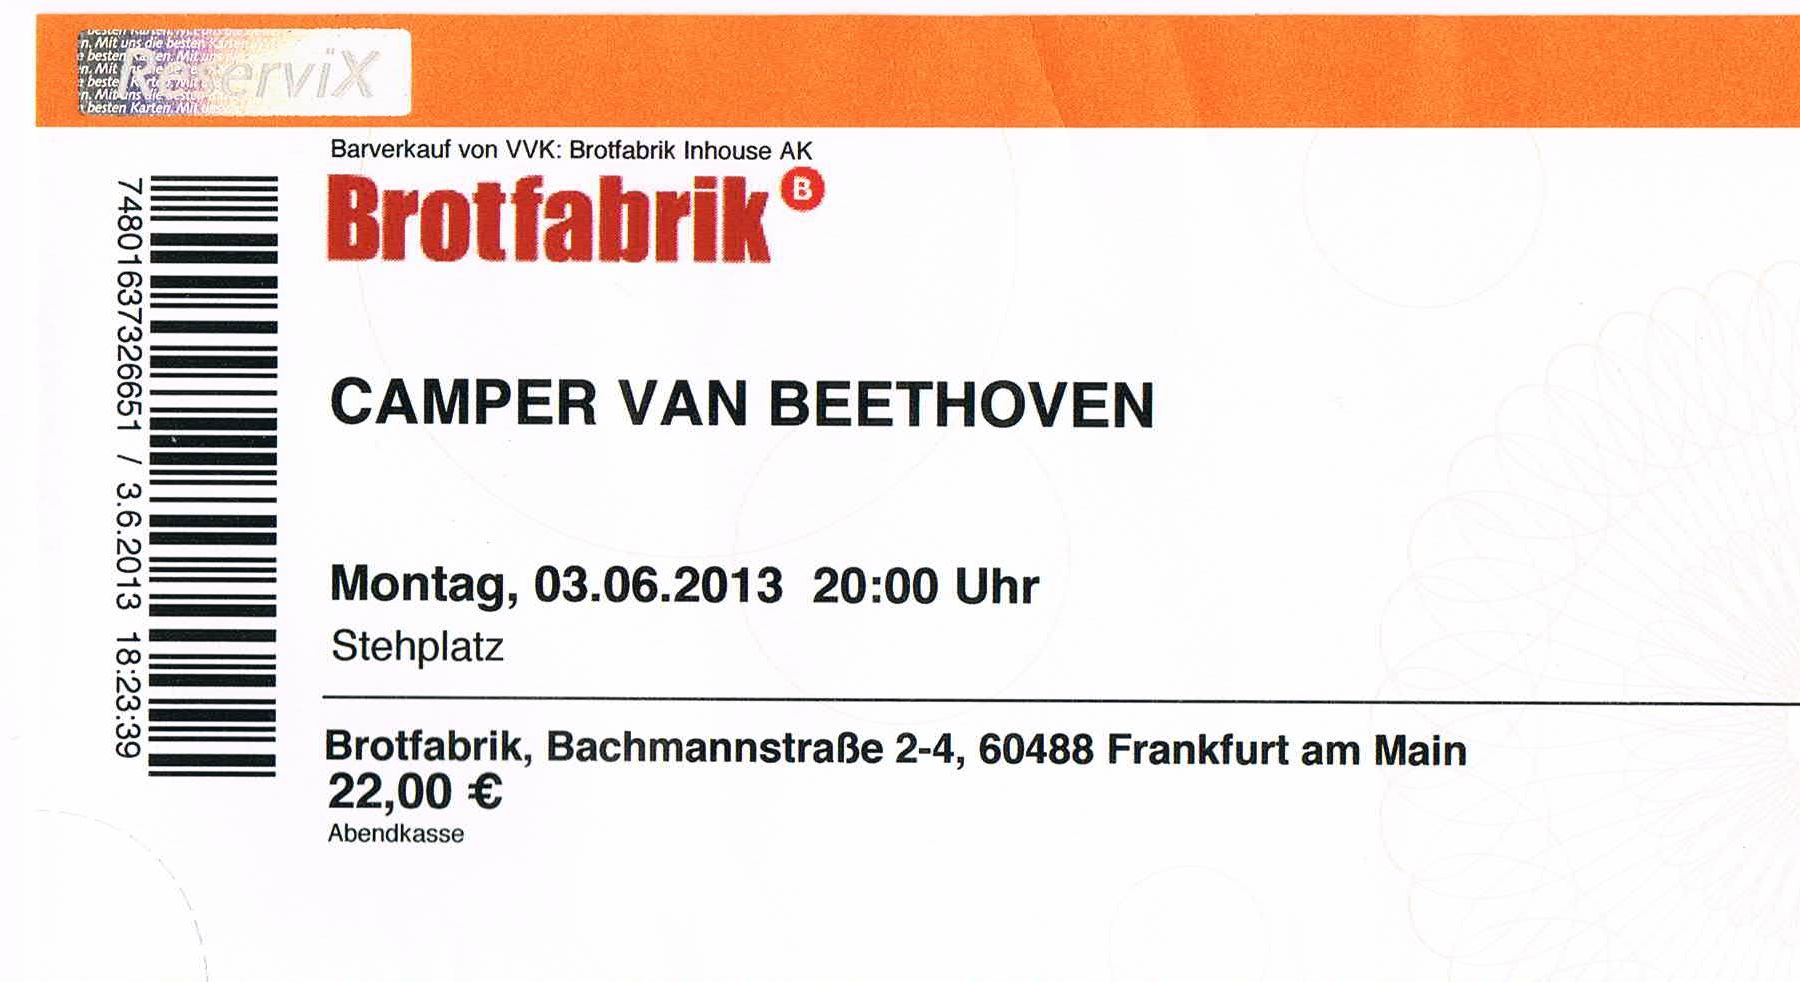 CamperVanBeethoven2013-06-03BrotfabrikFrankfurtGermany.JPG